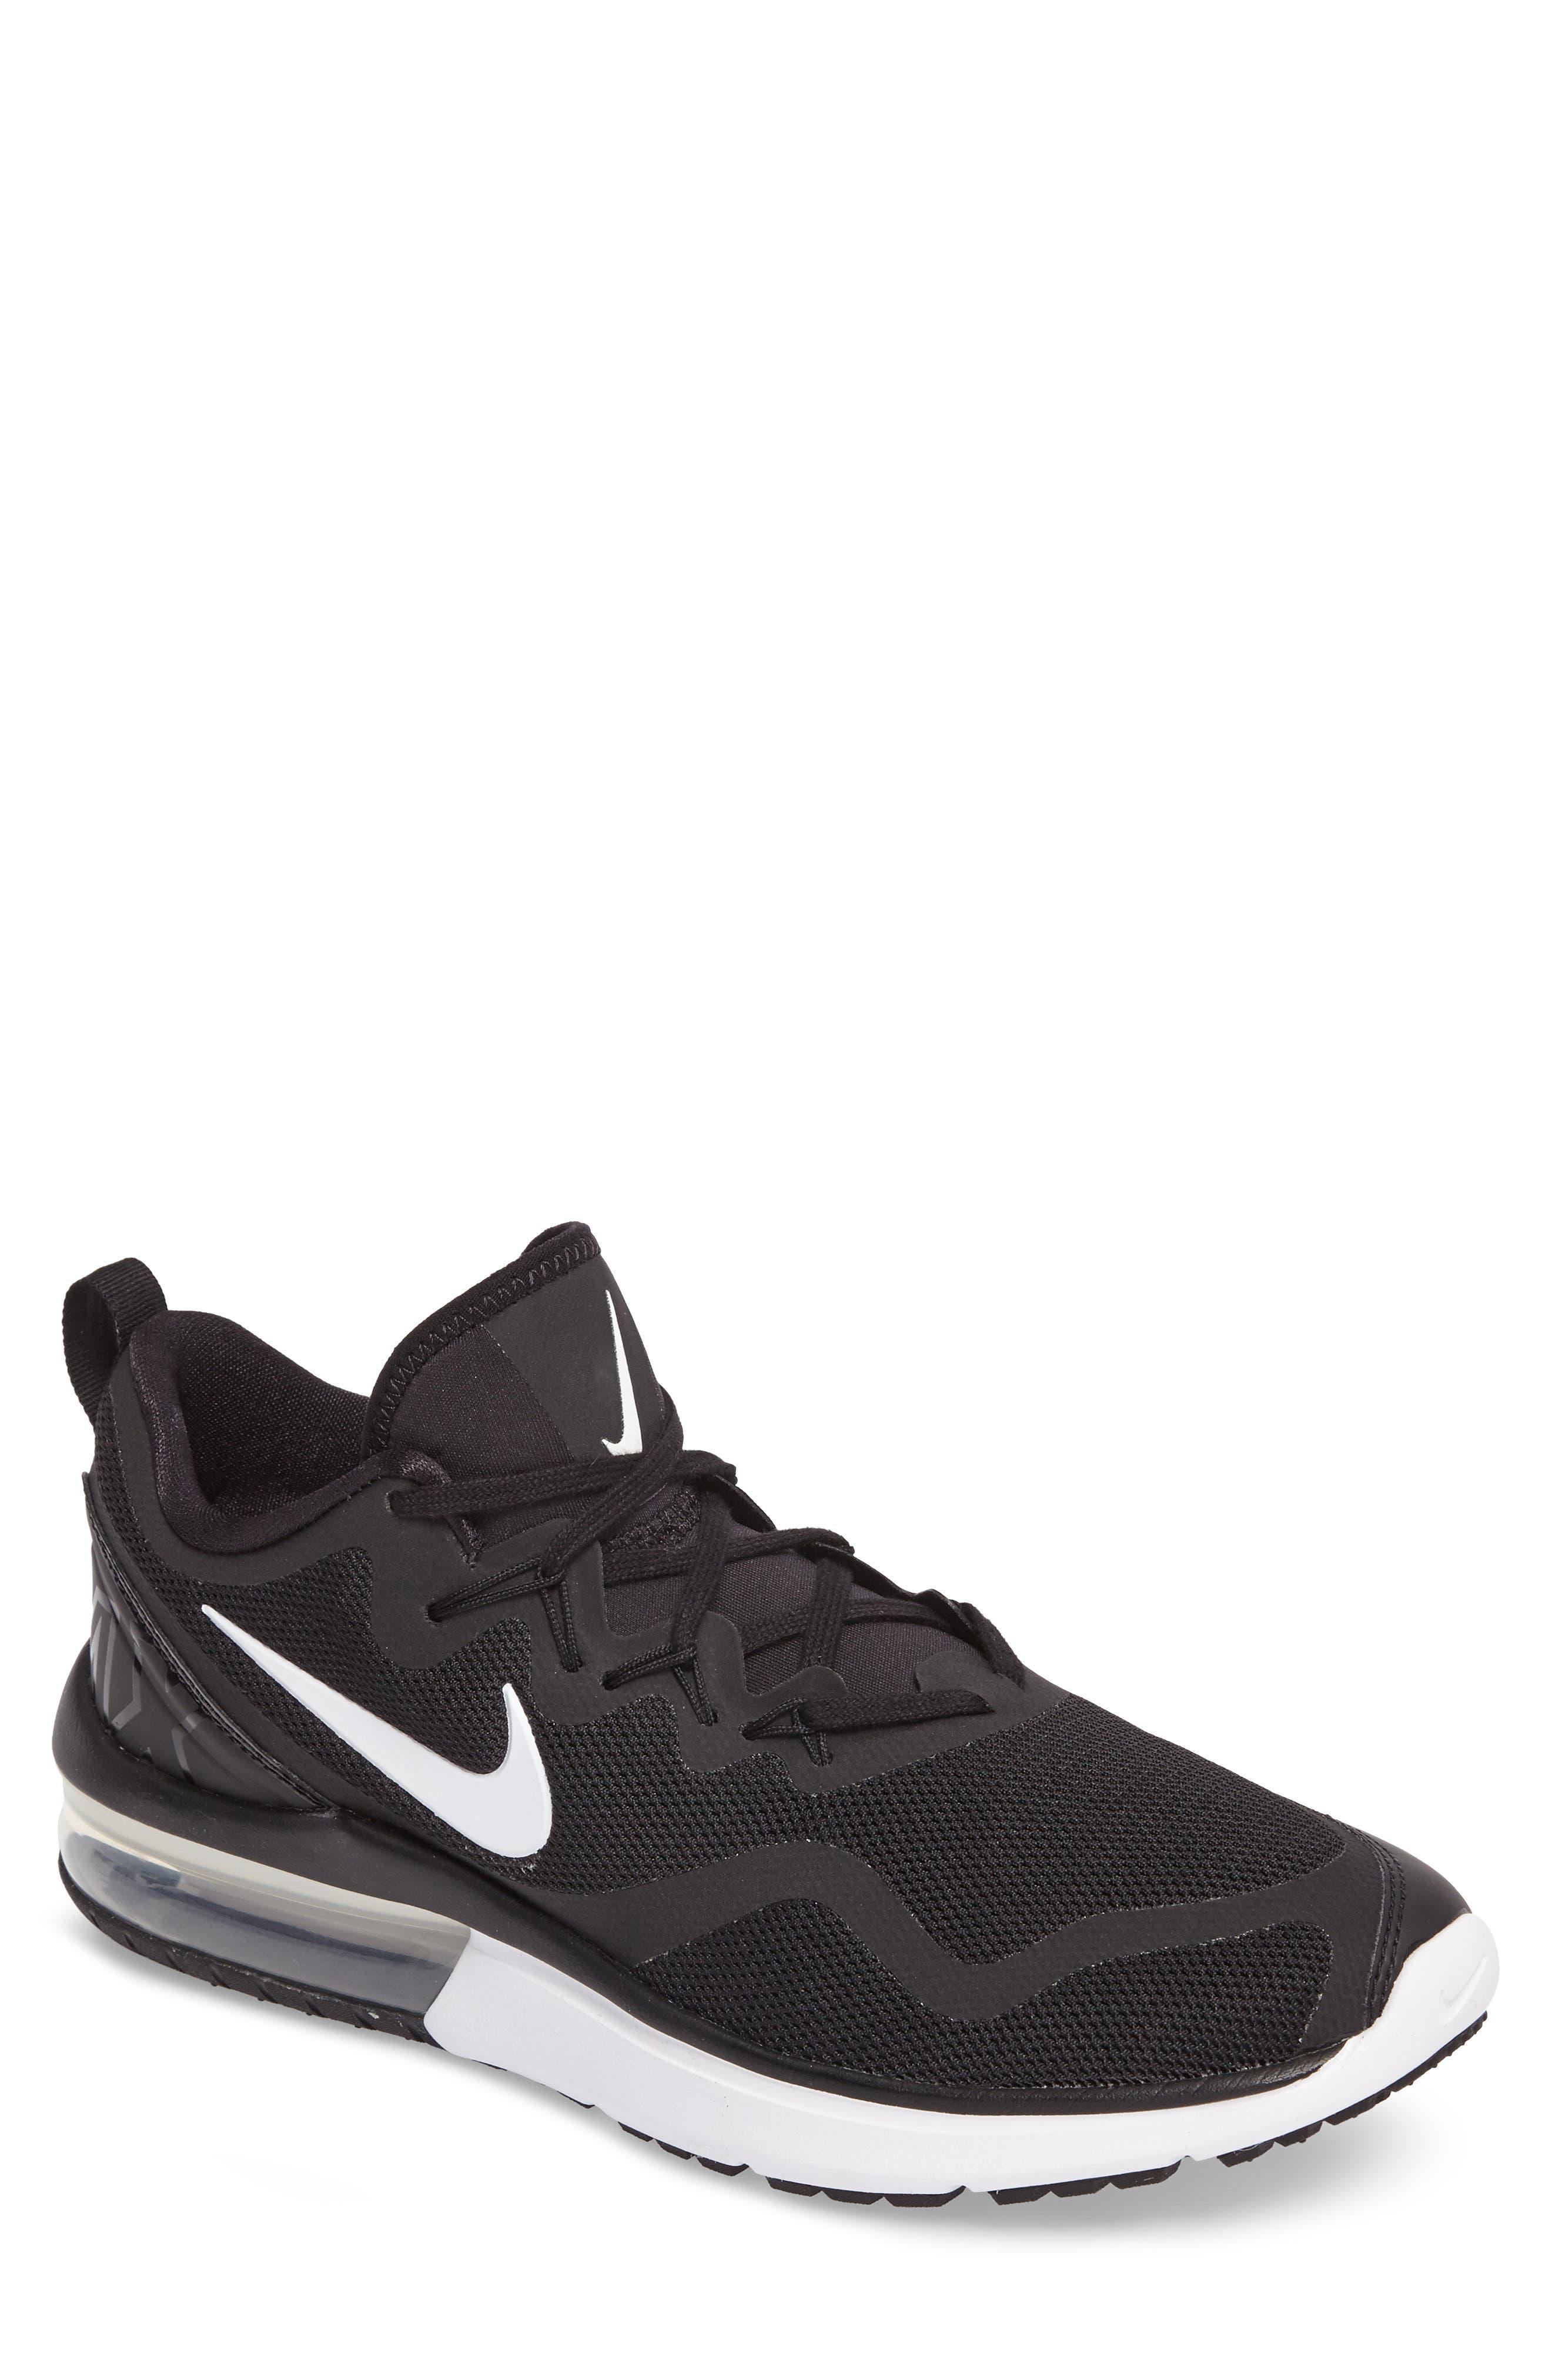 Menu0027s Nike Shoes | Nordstrom